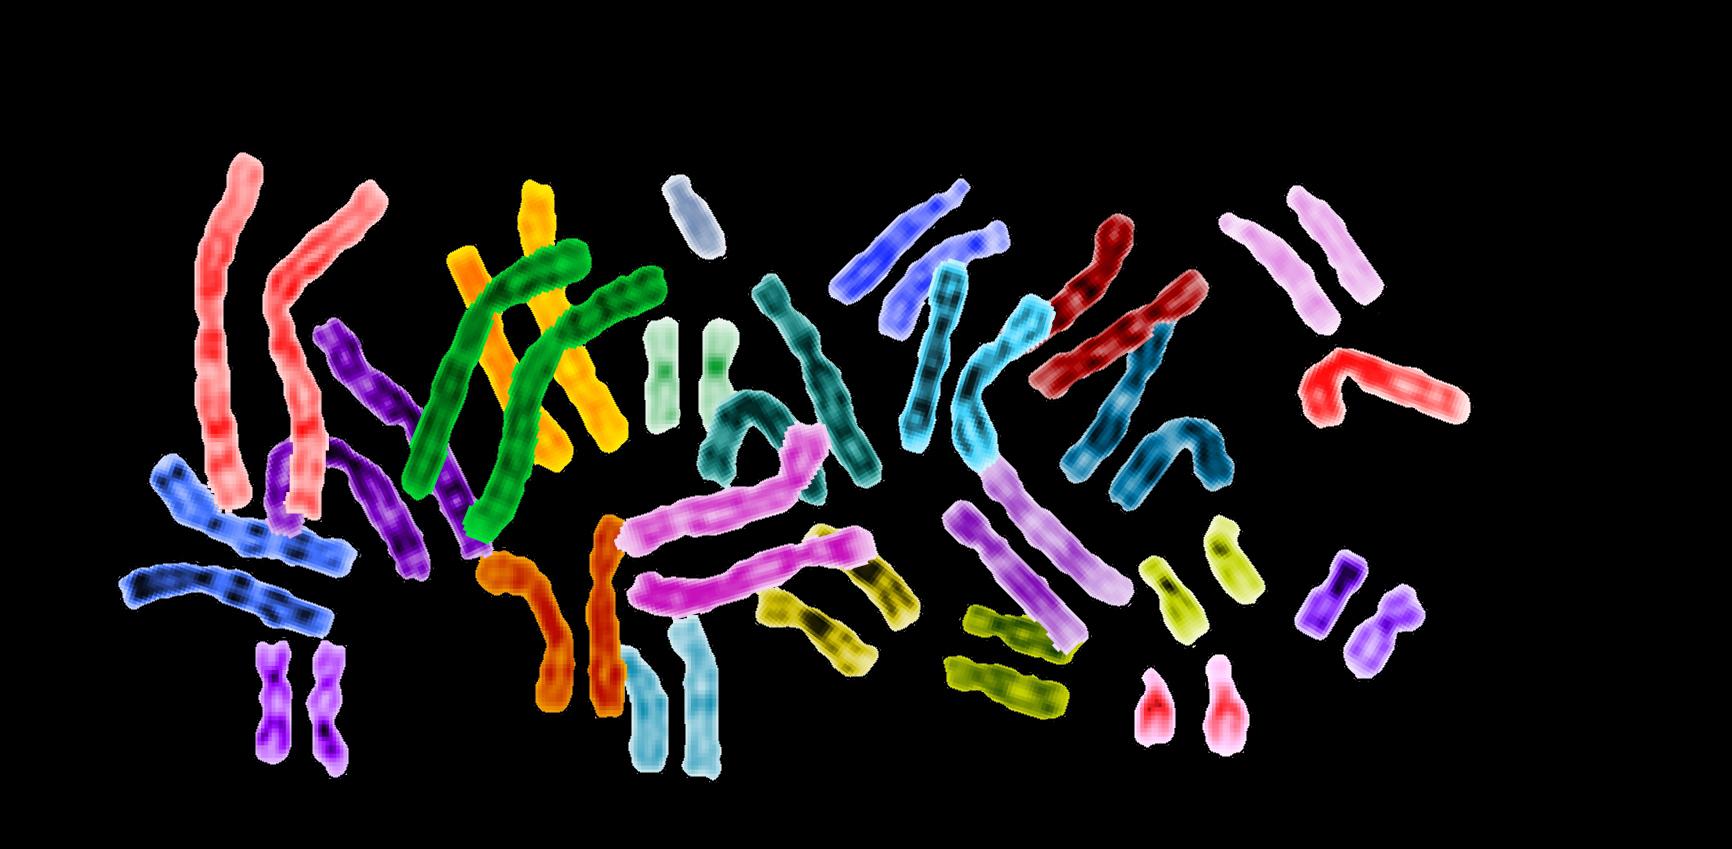 Human chromosomes on a black background.